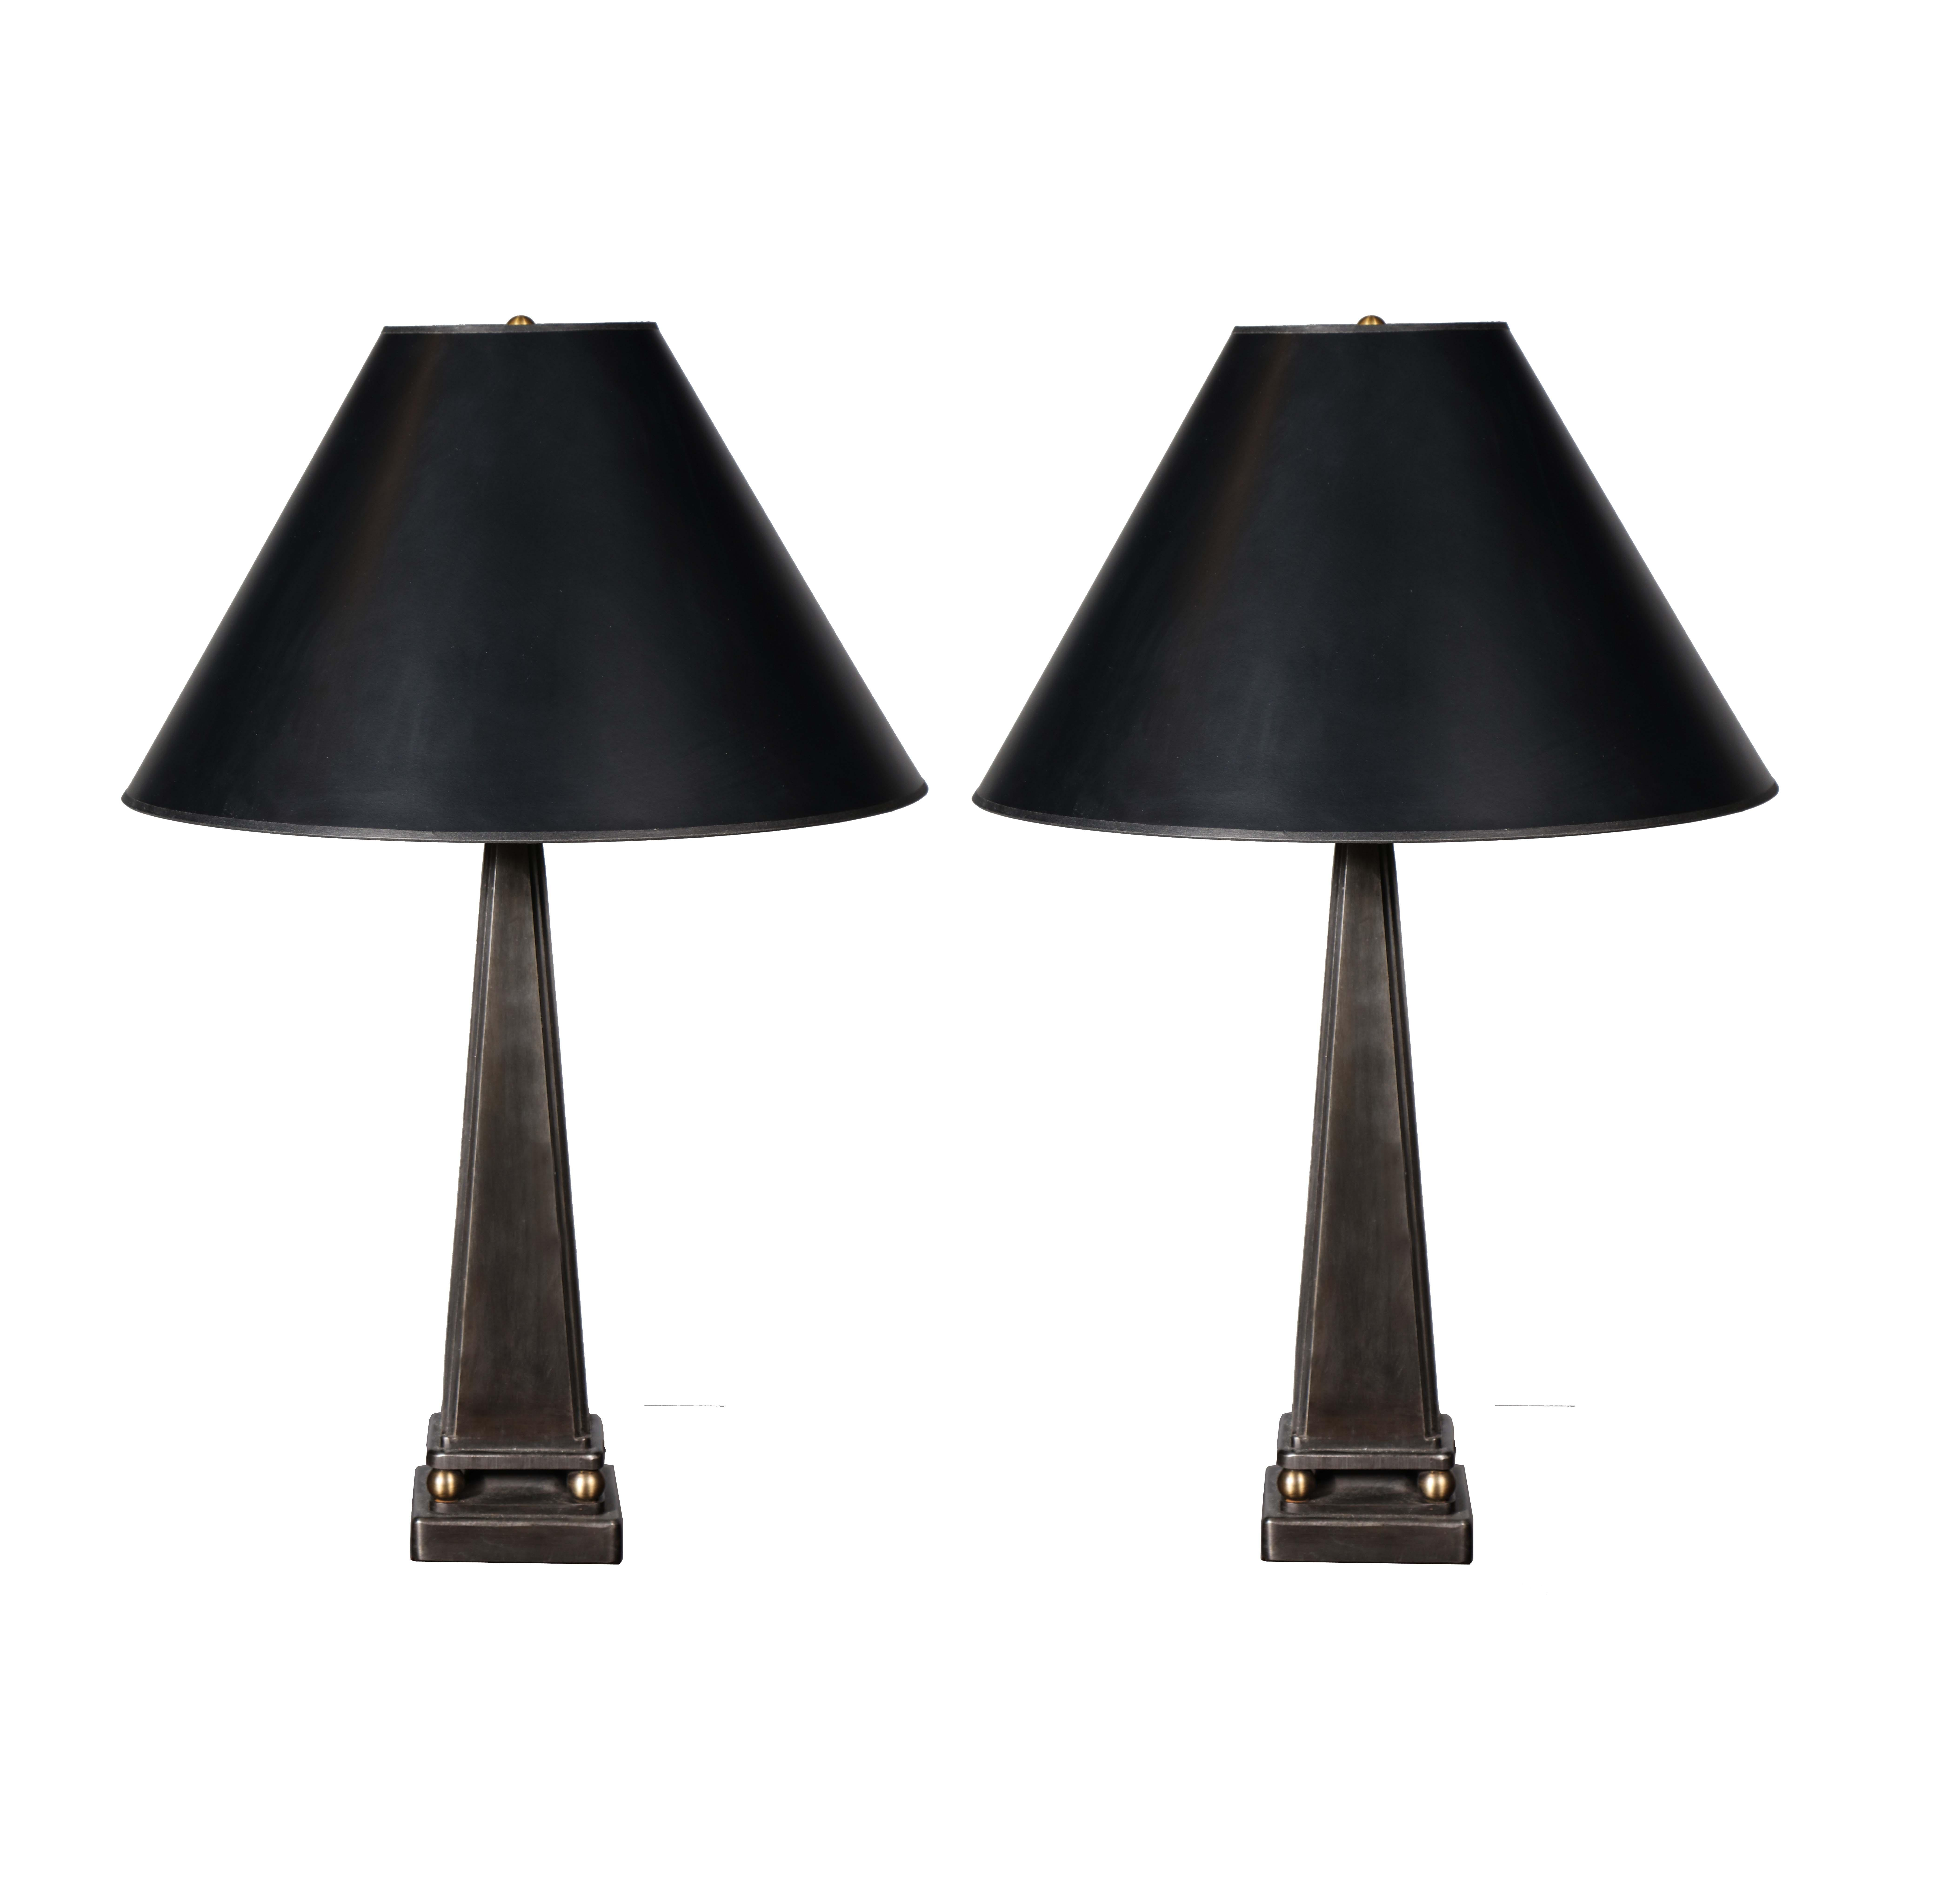 lighting dreams lamp silo pendant fixtures contemporary homes aurora star chocolate